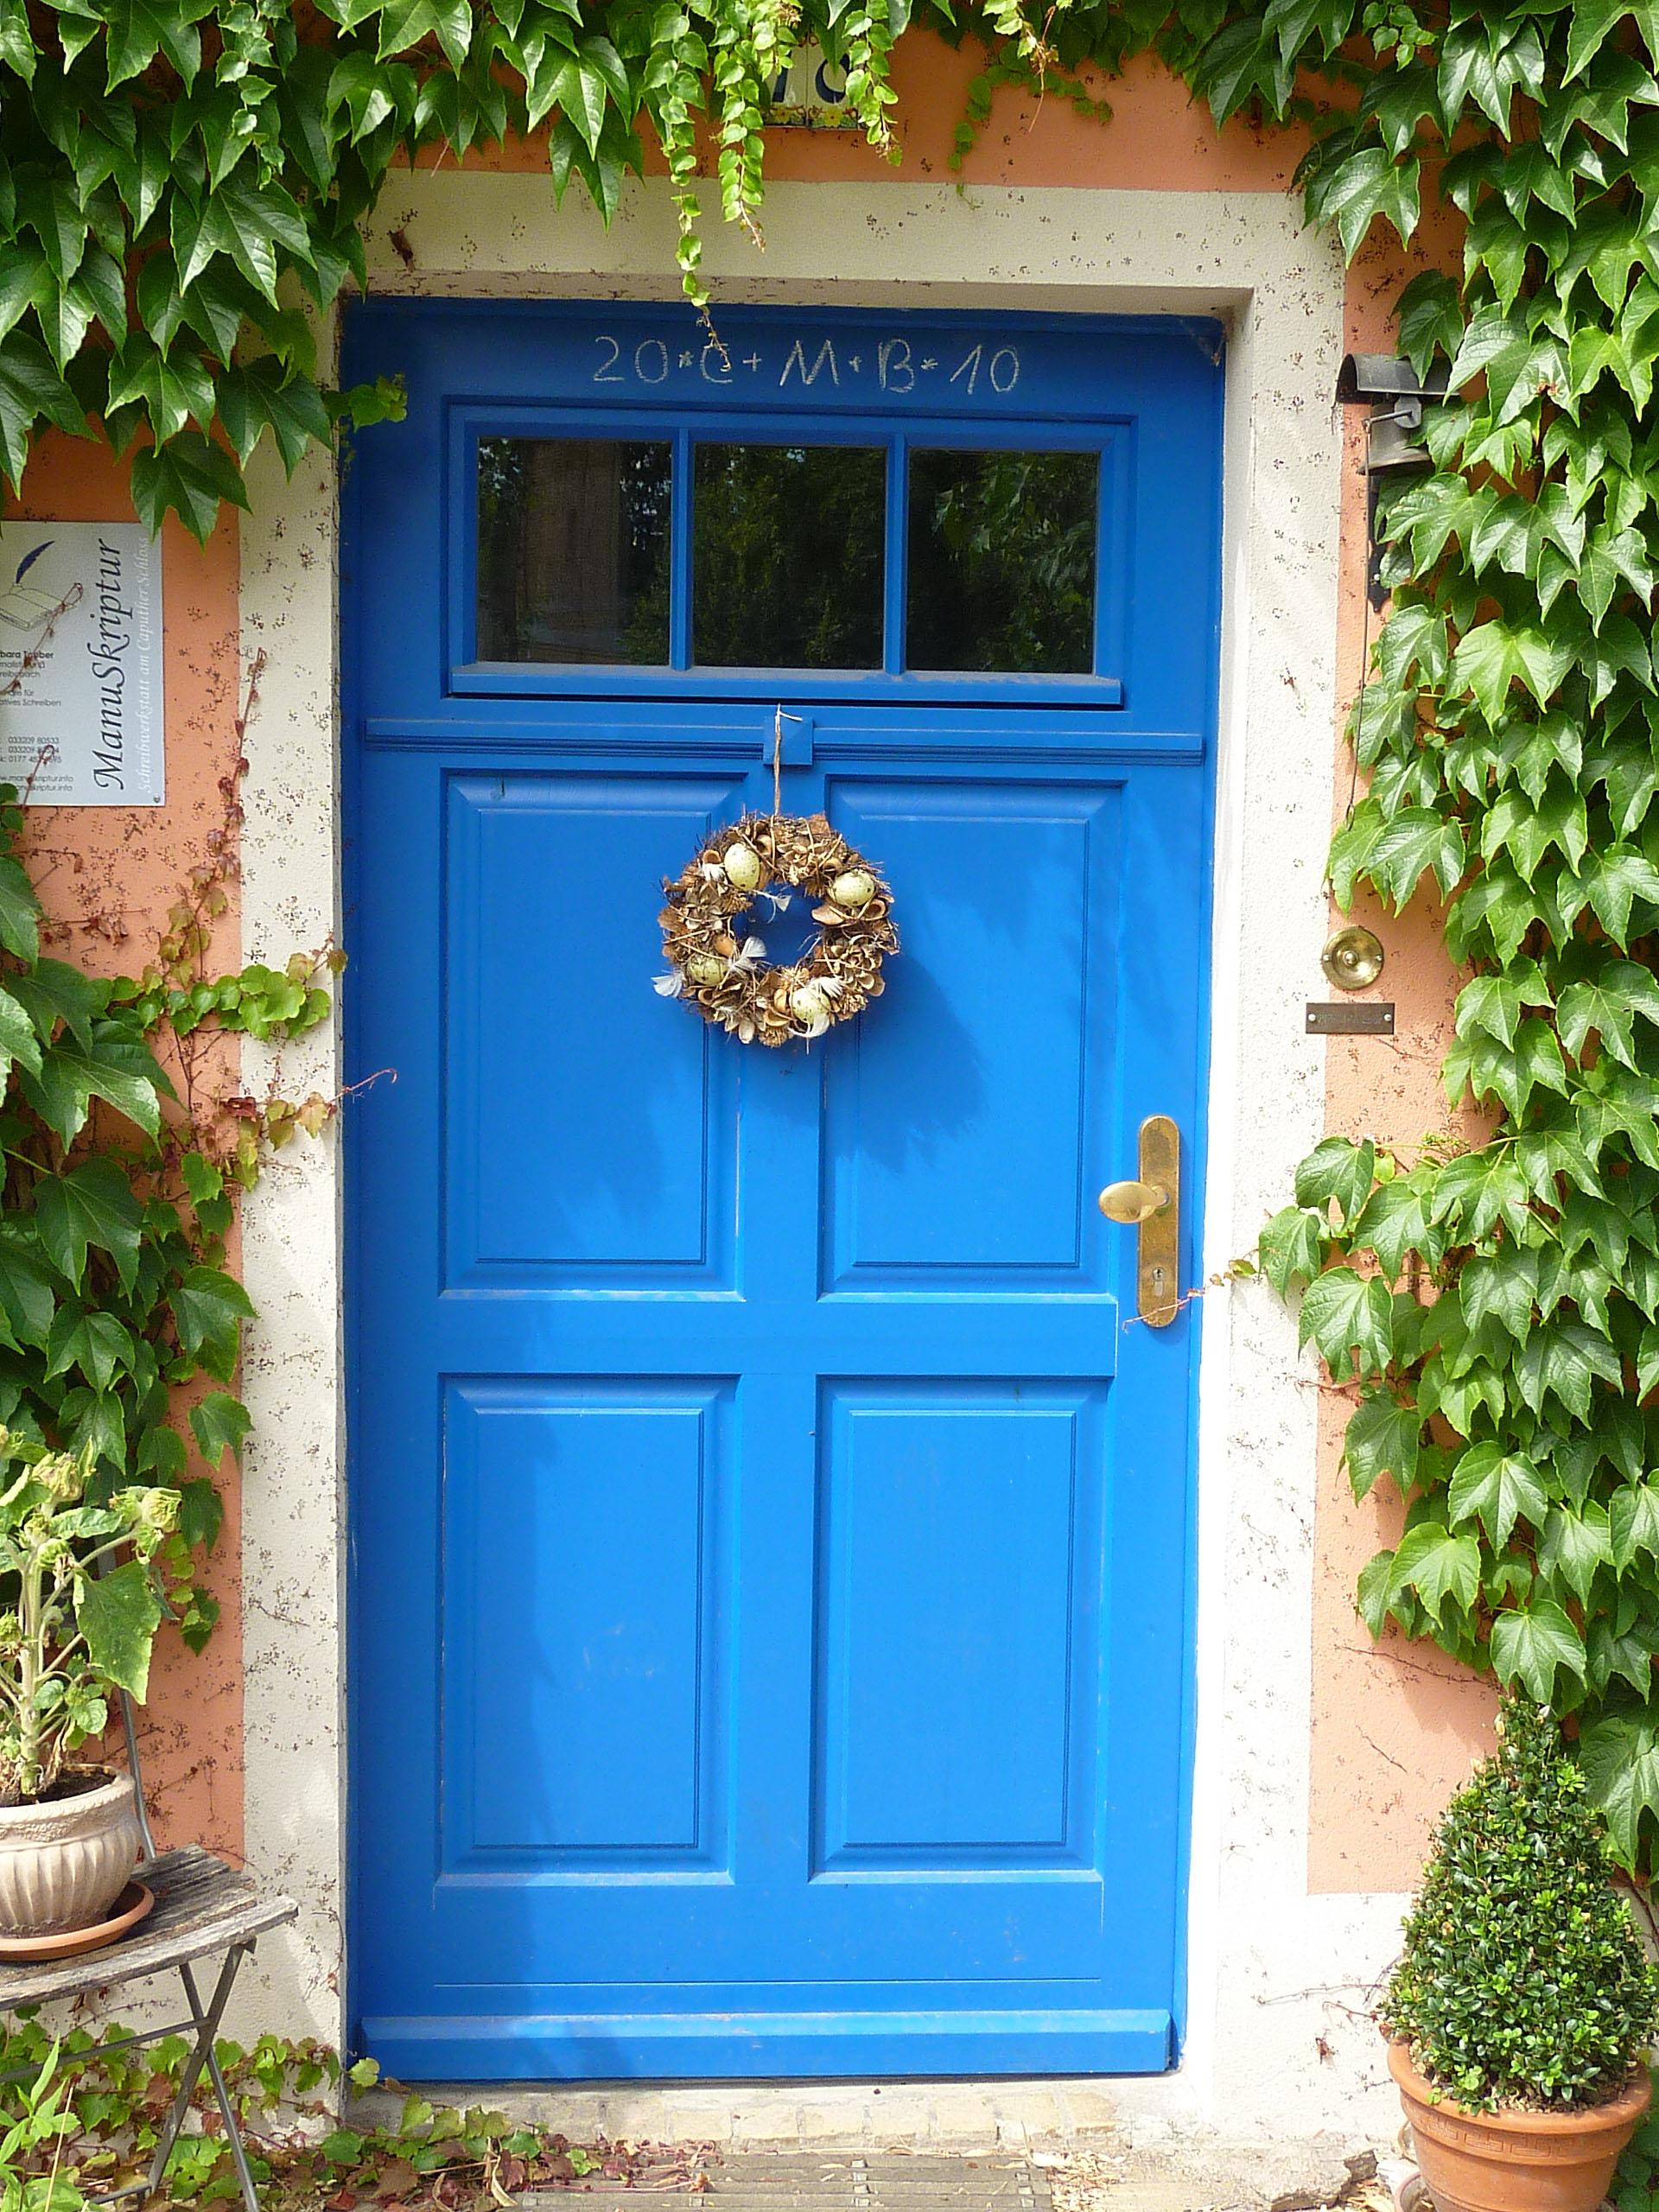 Eingangstüren landhaus  Hellmuts Travelpics » 26_Babelsberg / Potsdam - 25.-27.07.2010